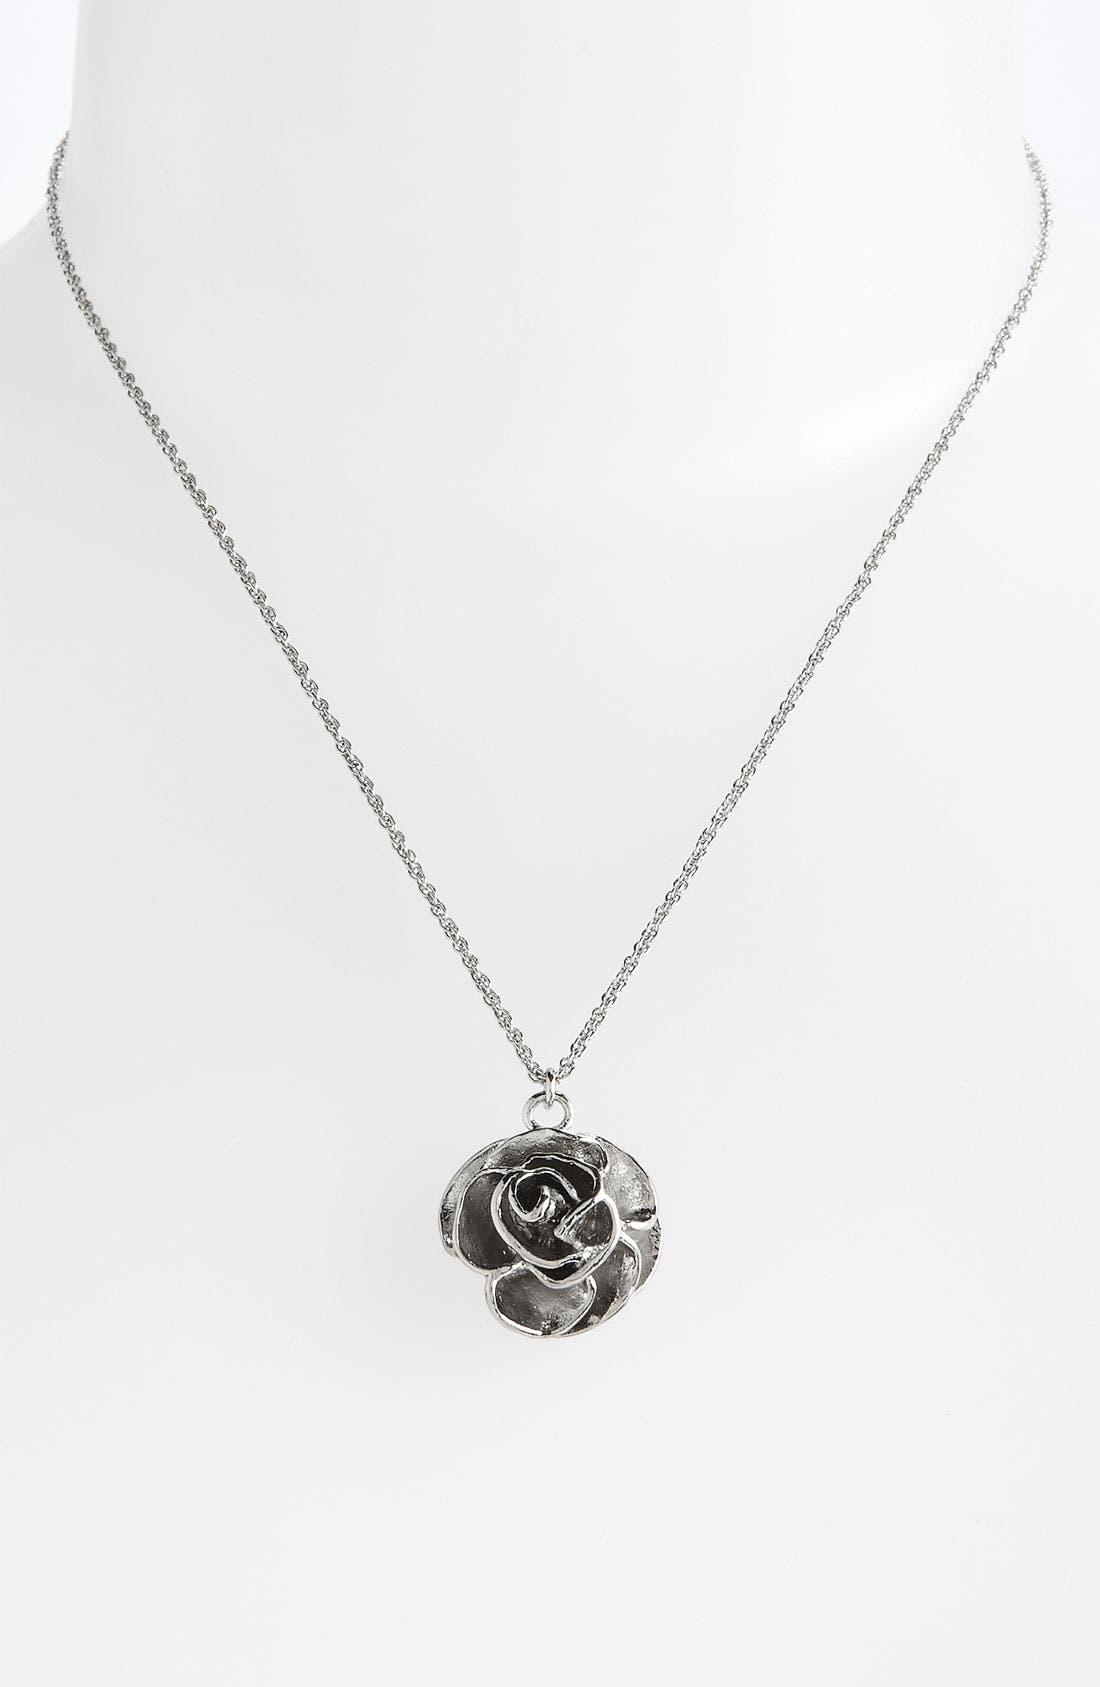 Alternate Image 1 Selected - Kendra Scott 'Michelle' Rose Pendant Necklace